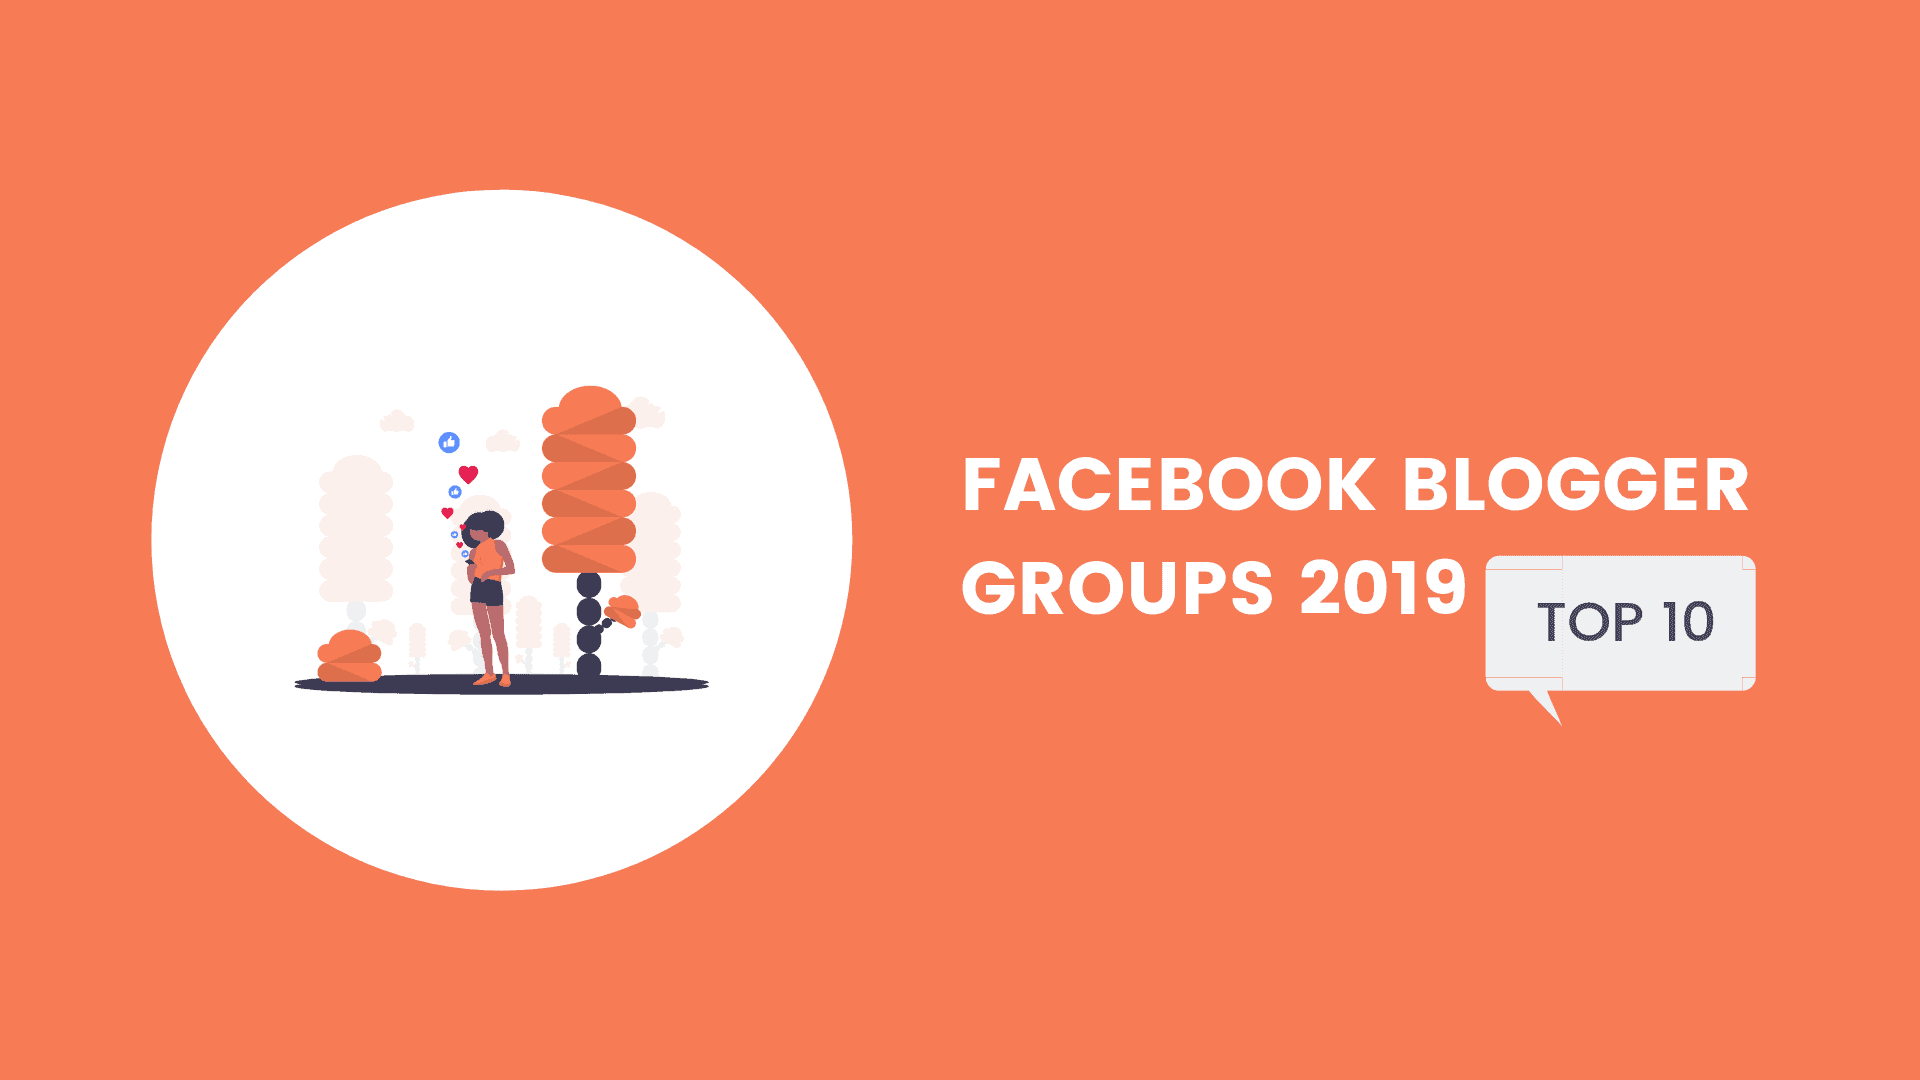 Facebook Blogger Groups 2019